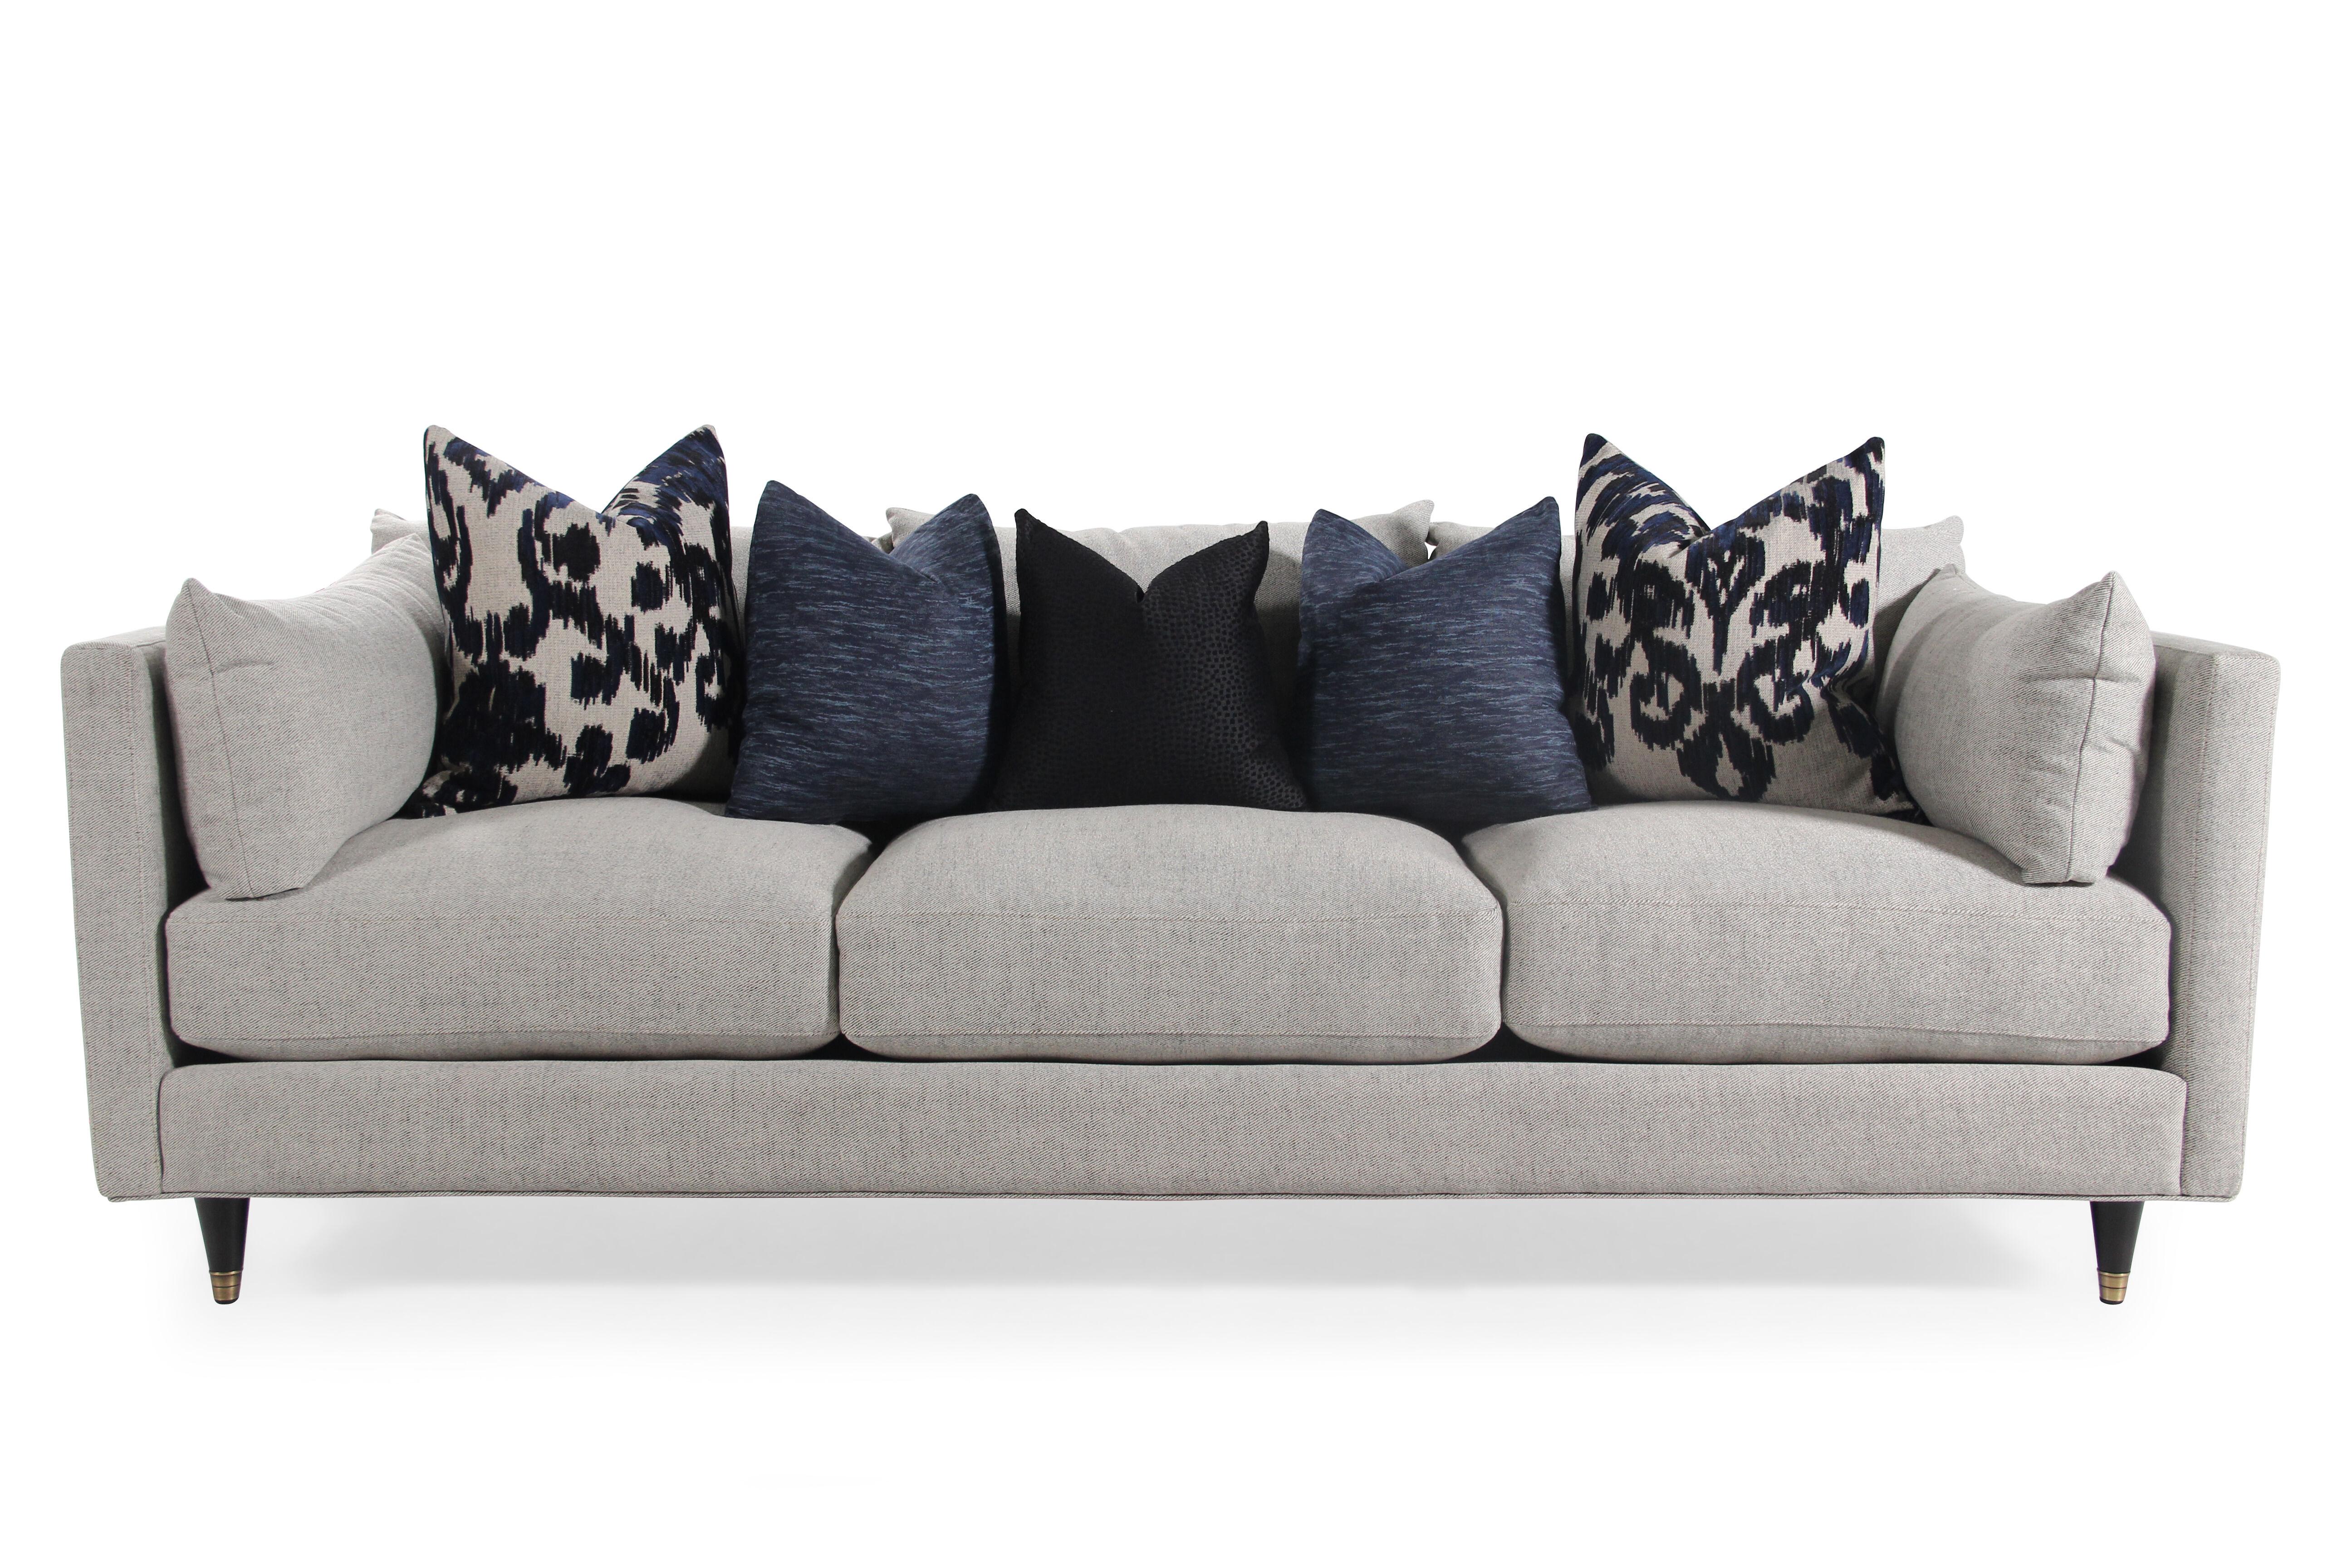 Nice Images Low Profile Mid Century Modern 45u0026quot; Sofa In Gray Low Profile  Mid Century Modern 45u0026quot; Sofa In Gray